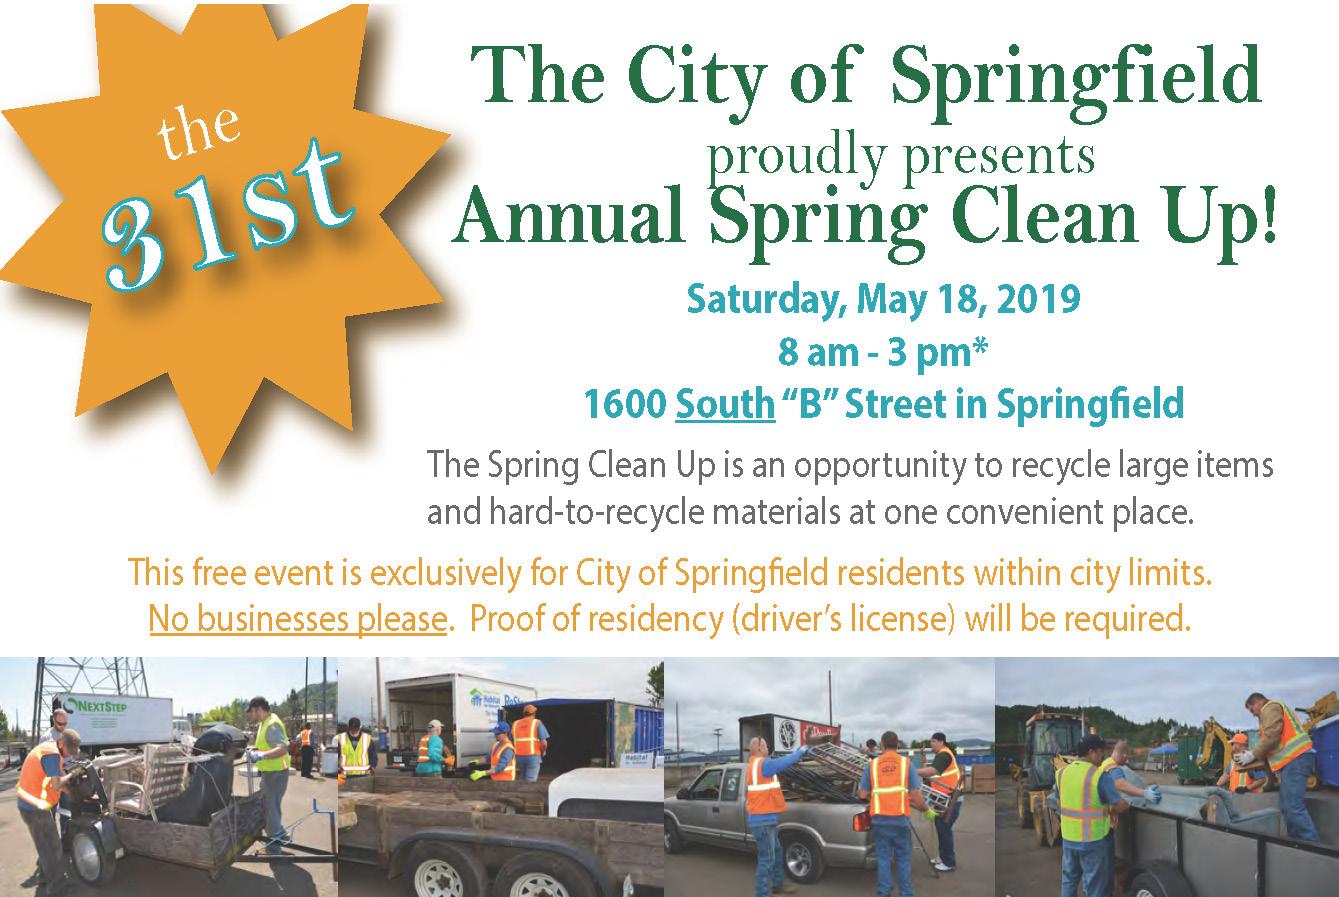 Spring Clean Up Web banner information